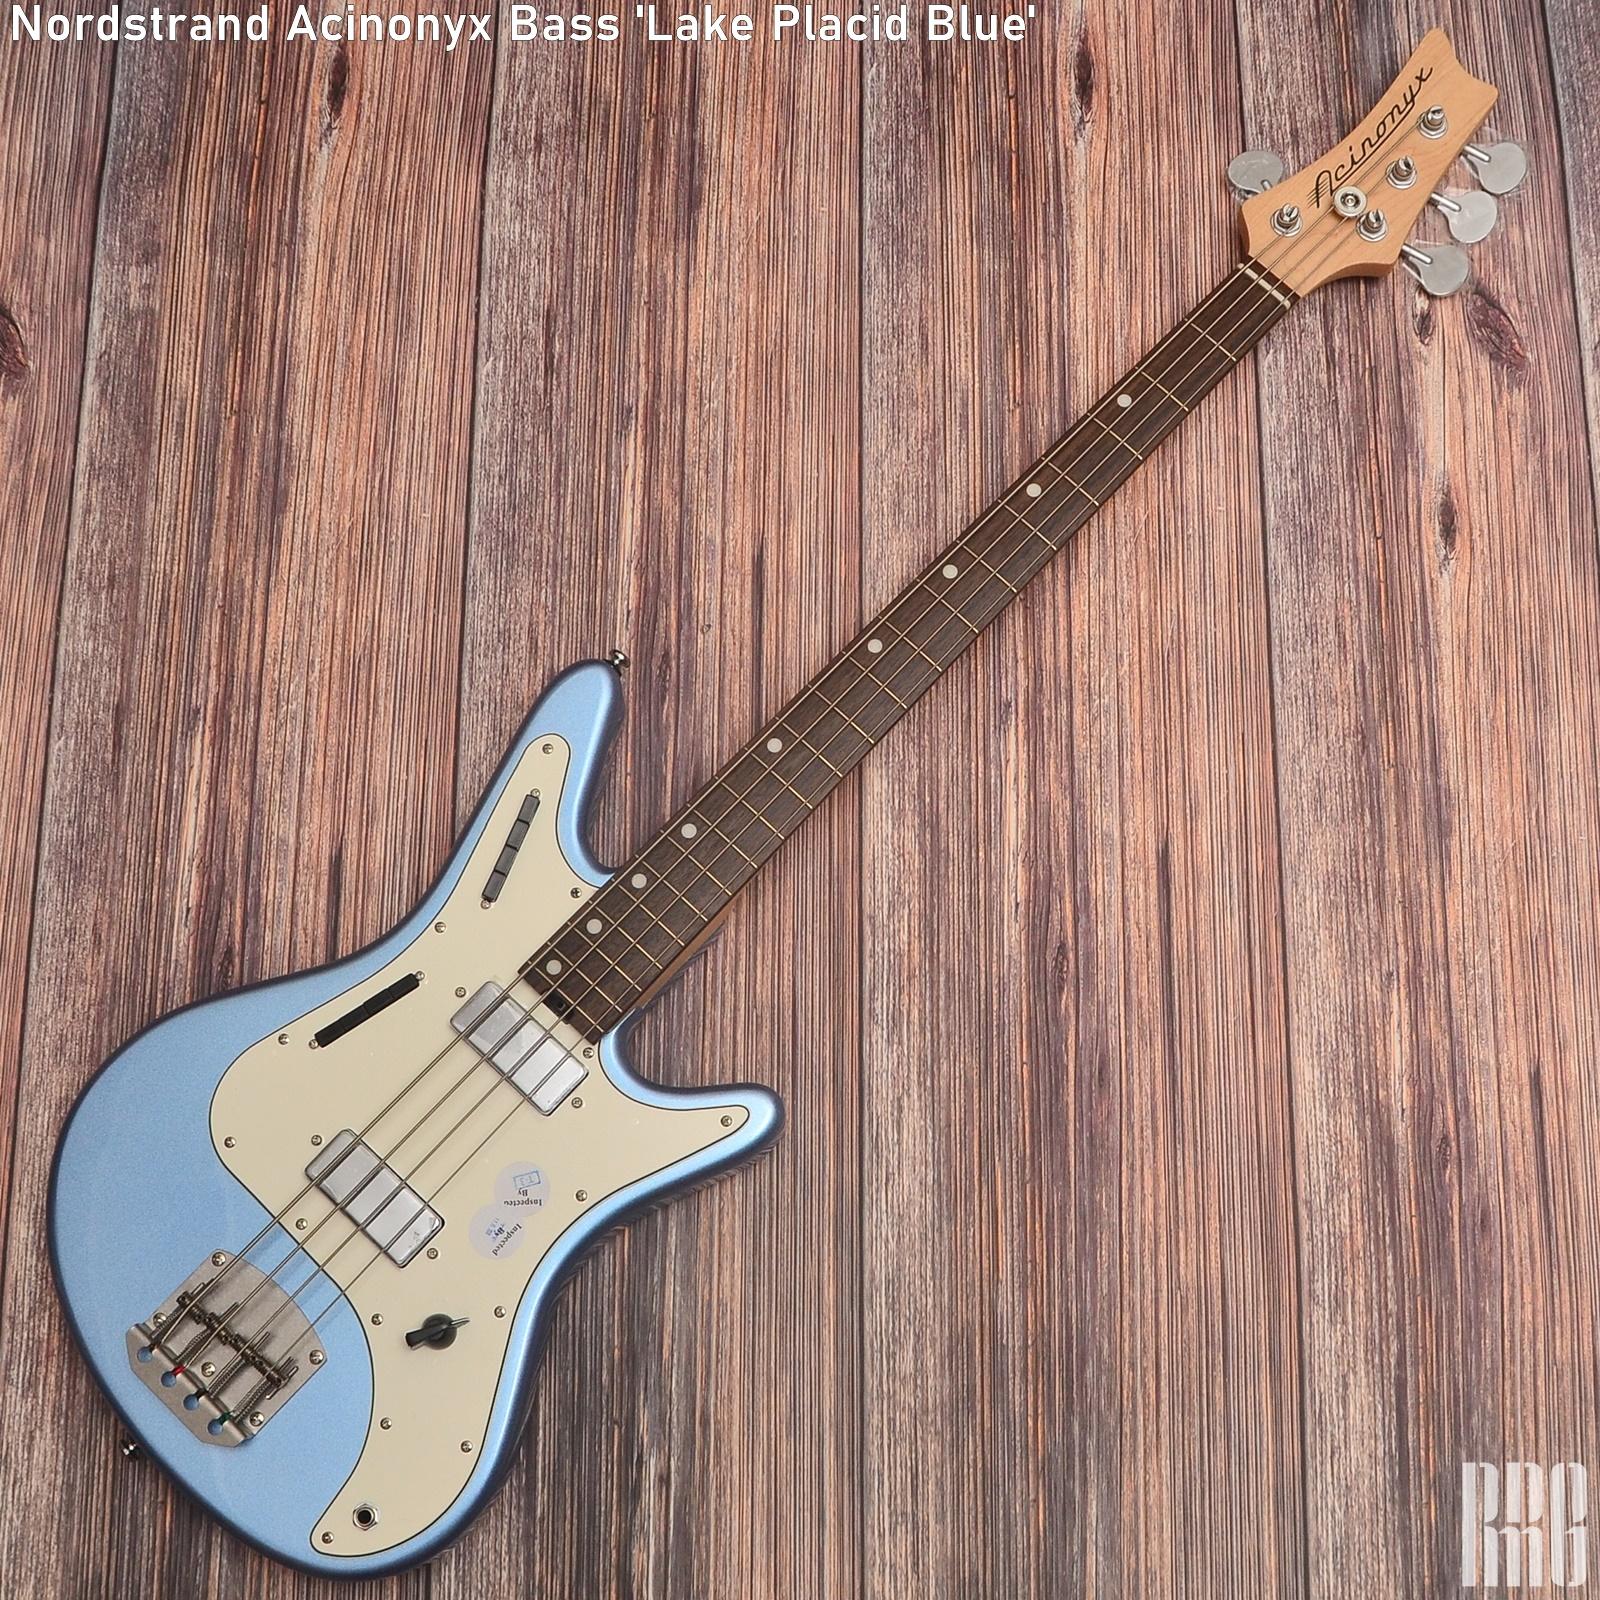 Nordstrand 經典復刻 'Acinonyx' Bass 首批到貨!